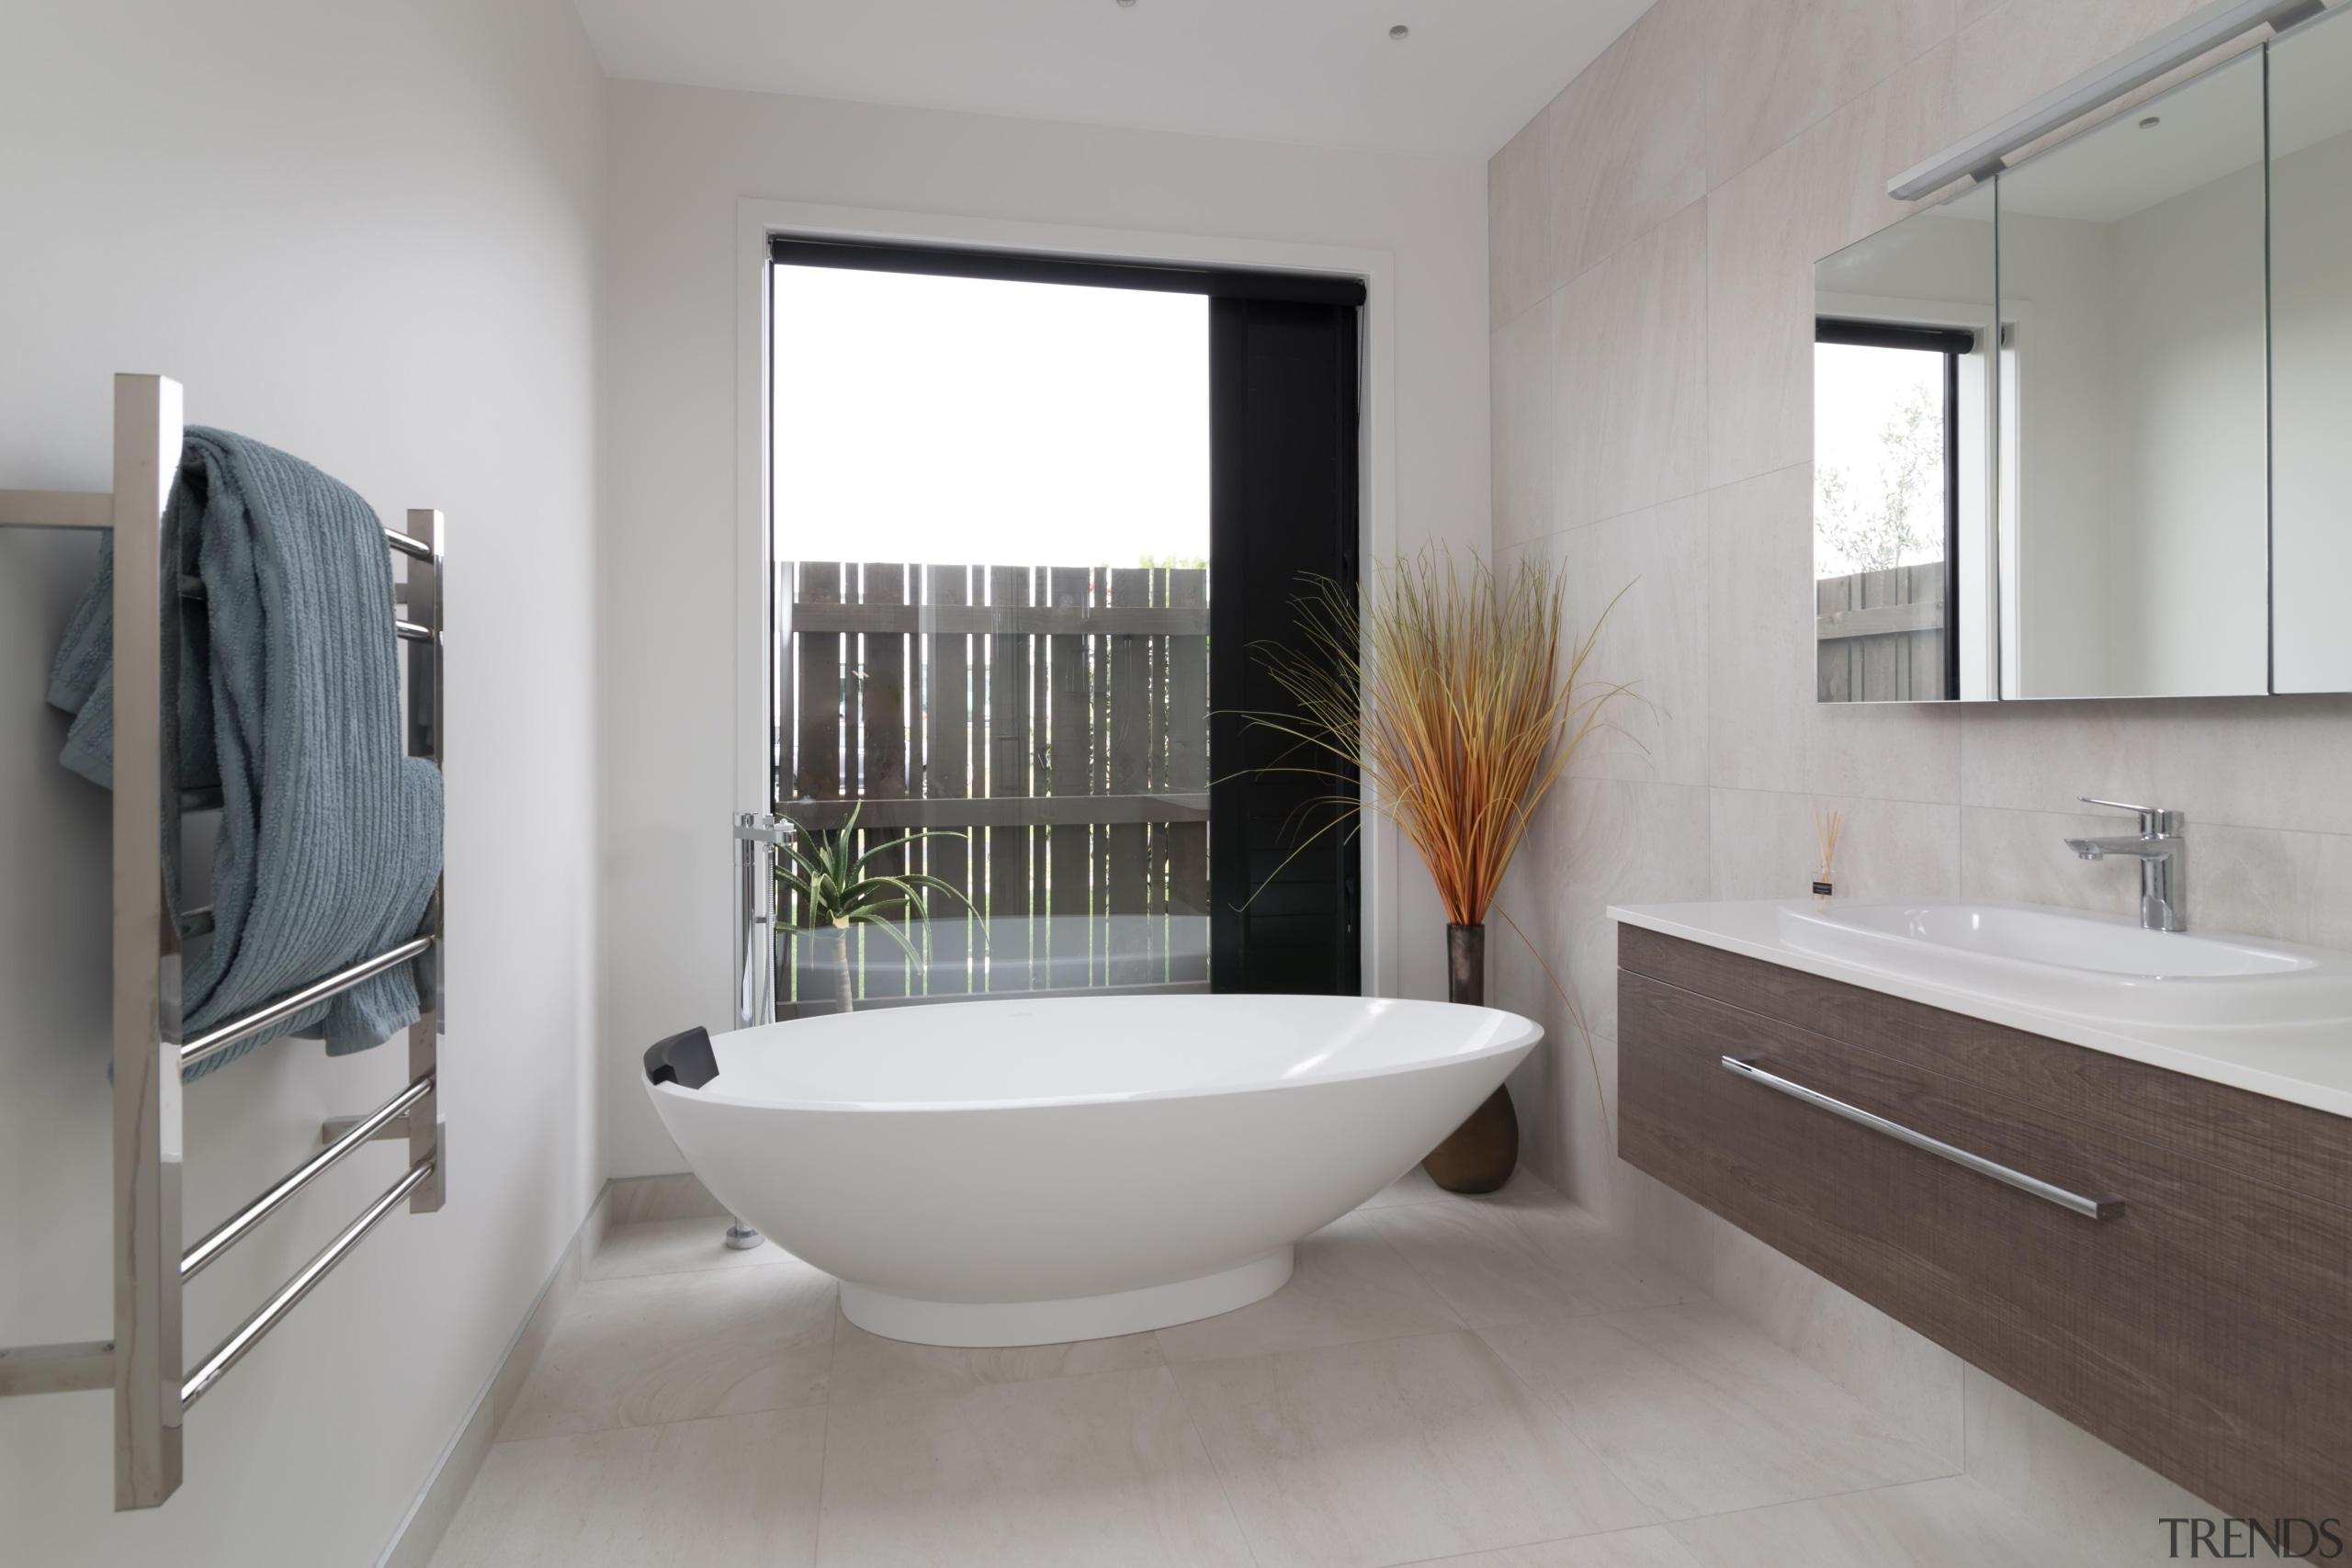 Landmark Homes Patiki Design Bathroom - Landmark Homes architecture, bathroom, bathroom accessory, floor, interior design, property, real estate, room, gray